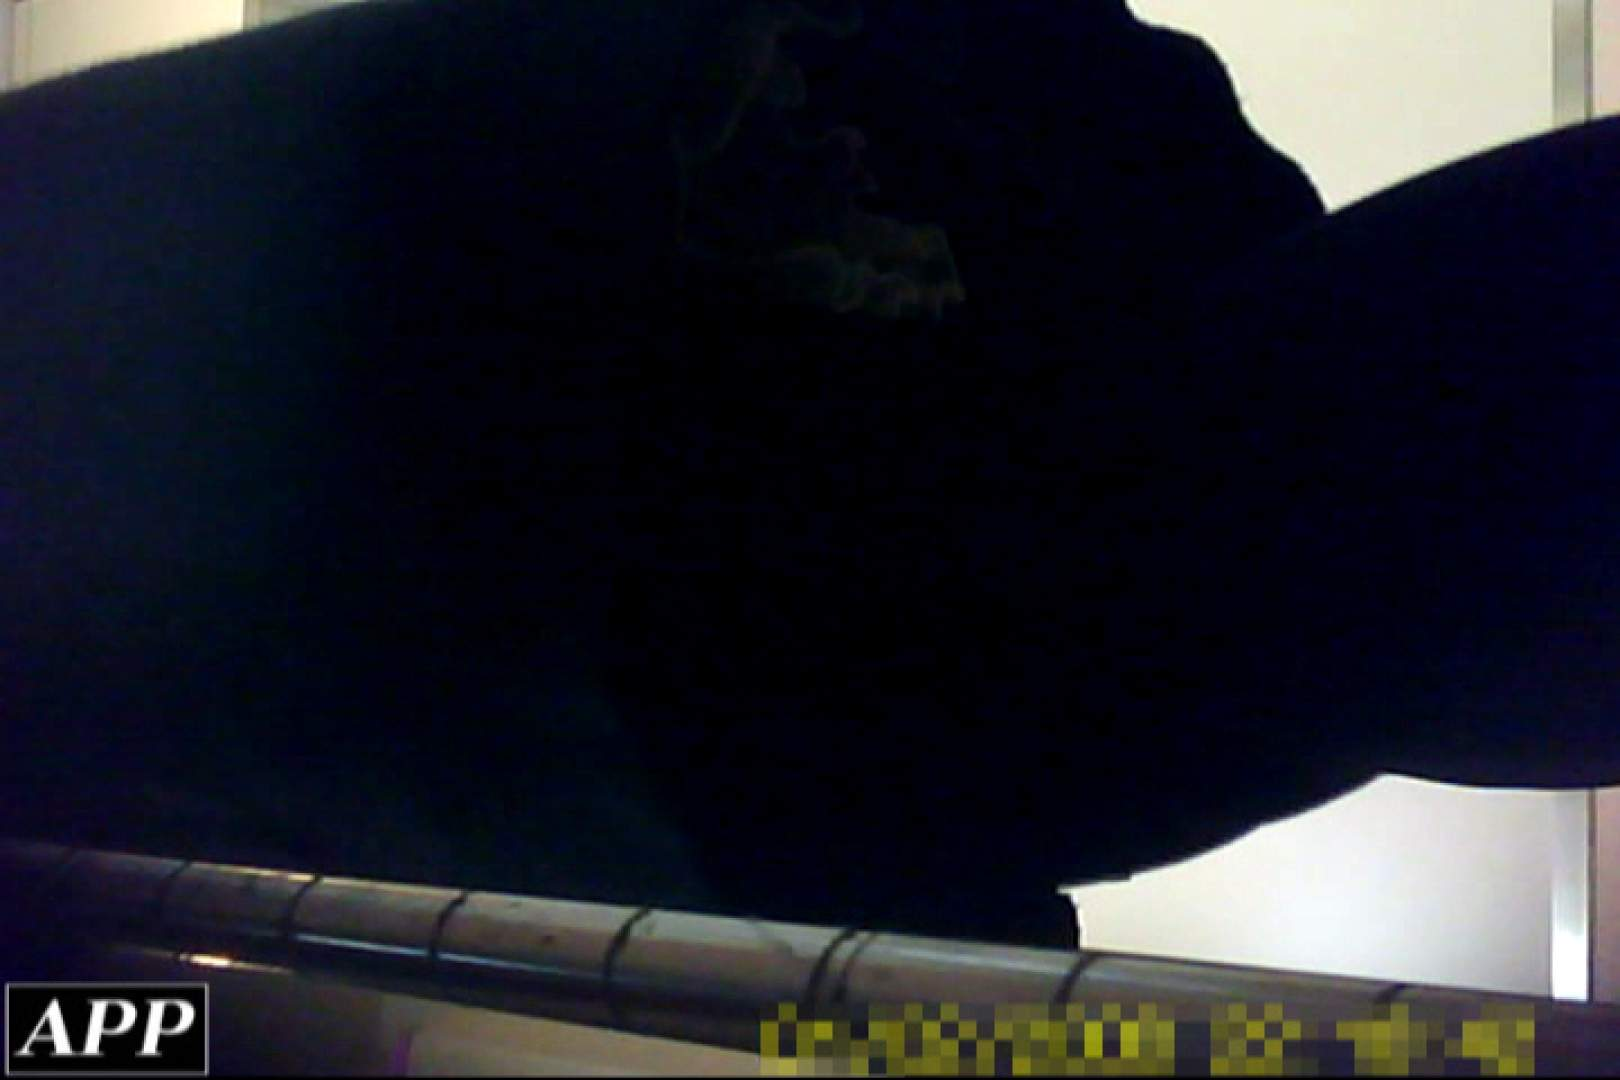 3視点洗面所 vol.110 OLハメ撮り  111Pix 1